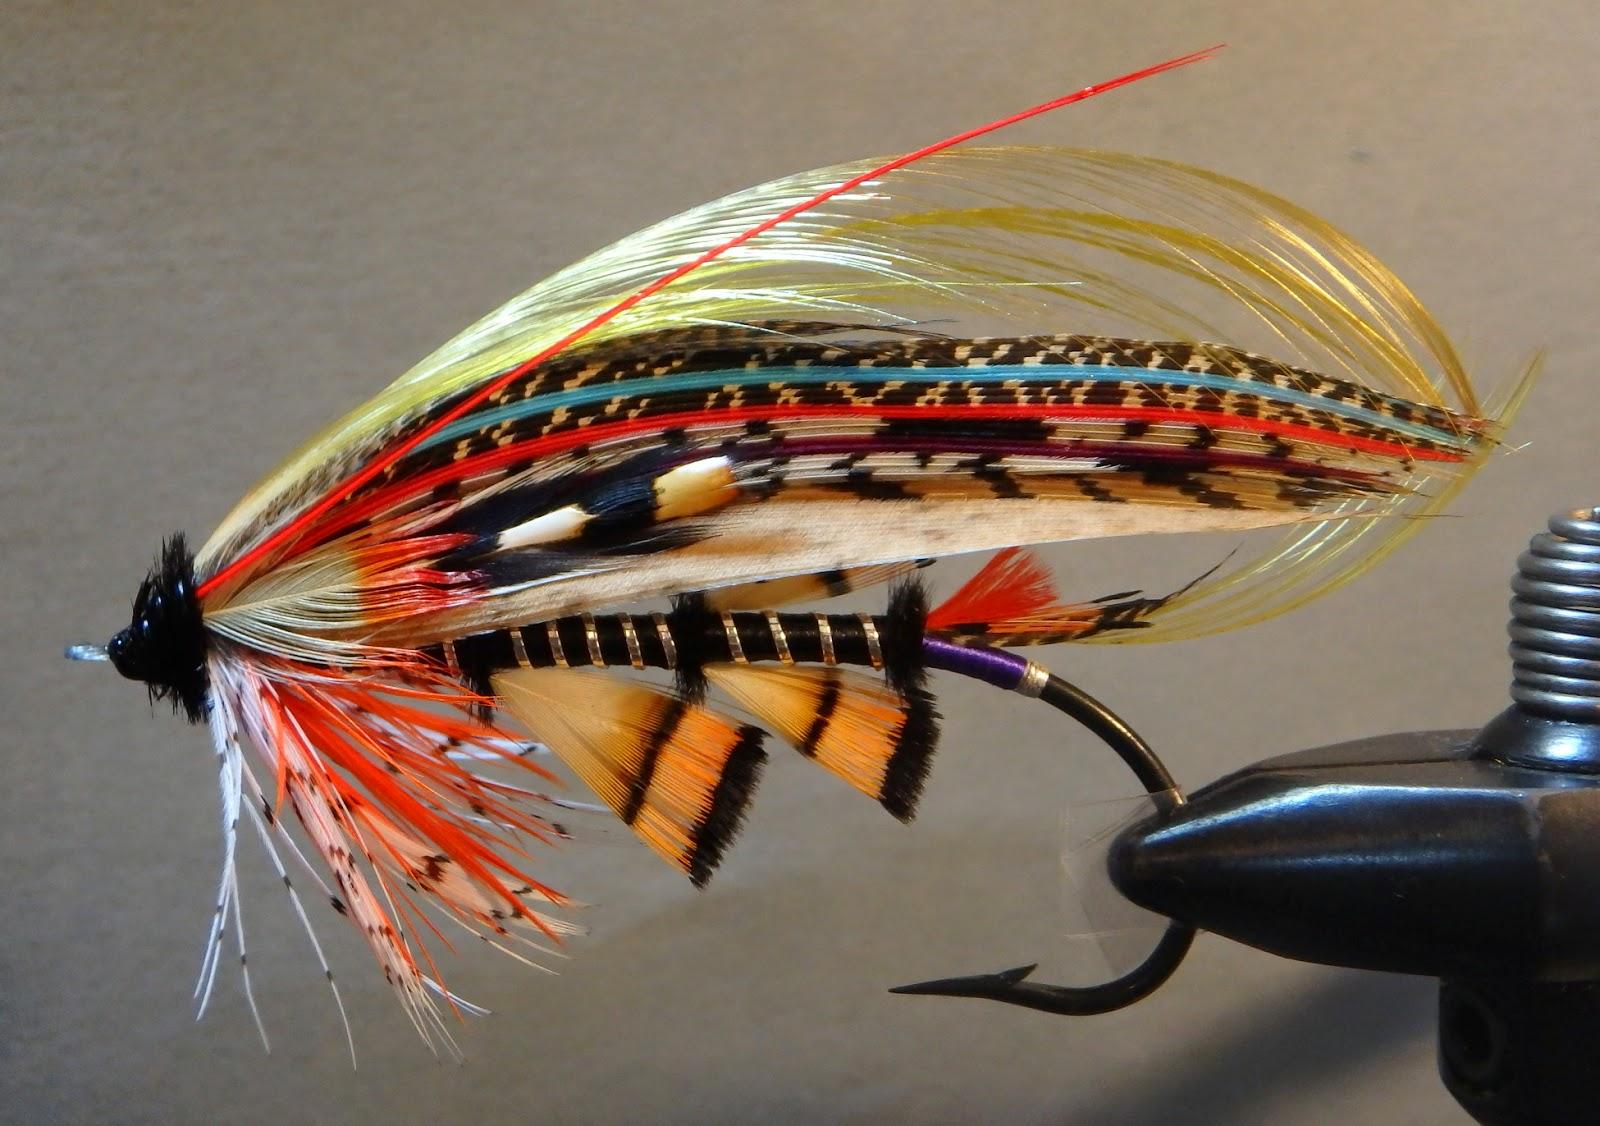 Online Fly Catalog: LEFTY ANGLER & FLIES in Livingston, MT ... Classic Atlantic Salmon Fly Patterns